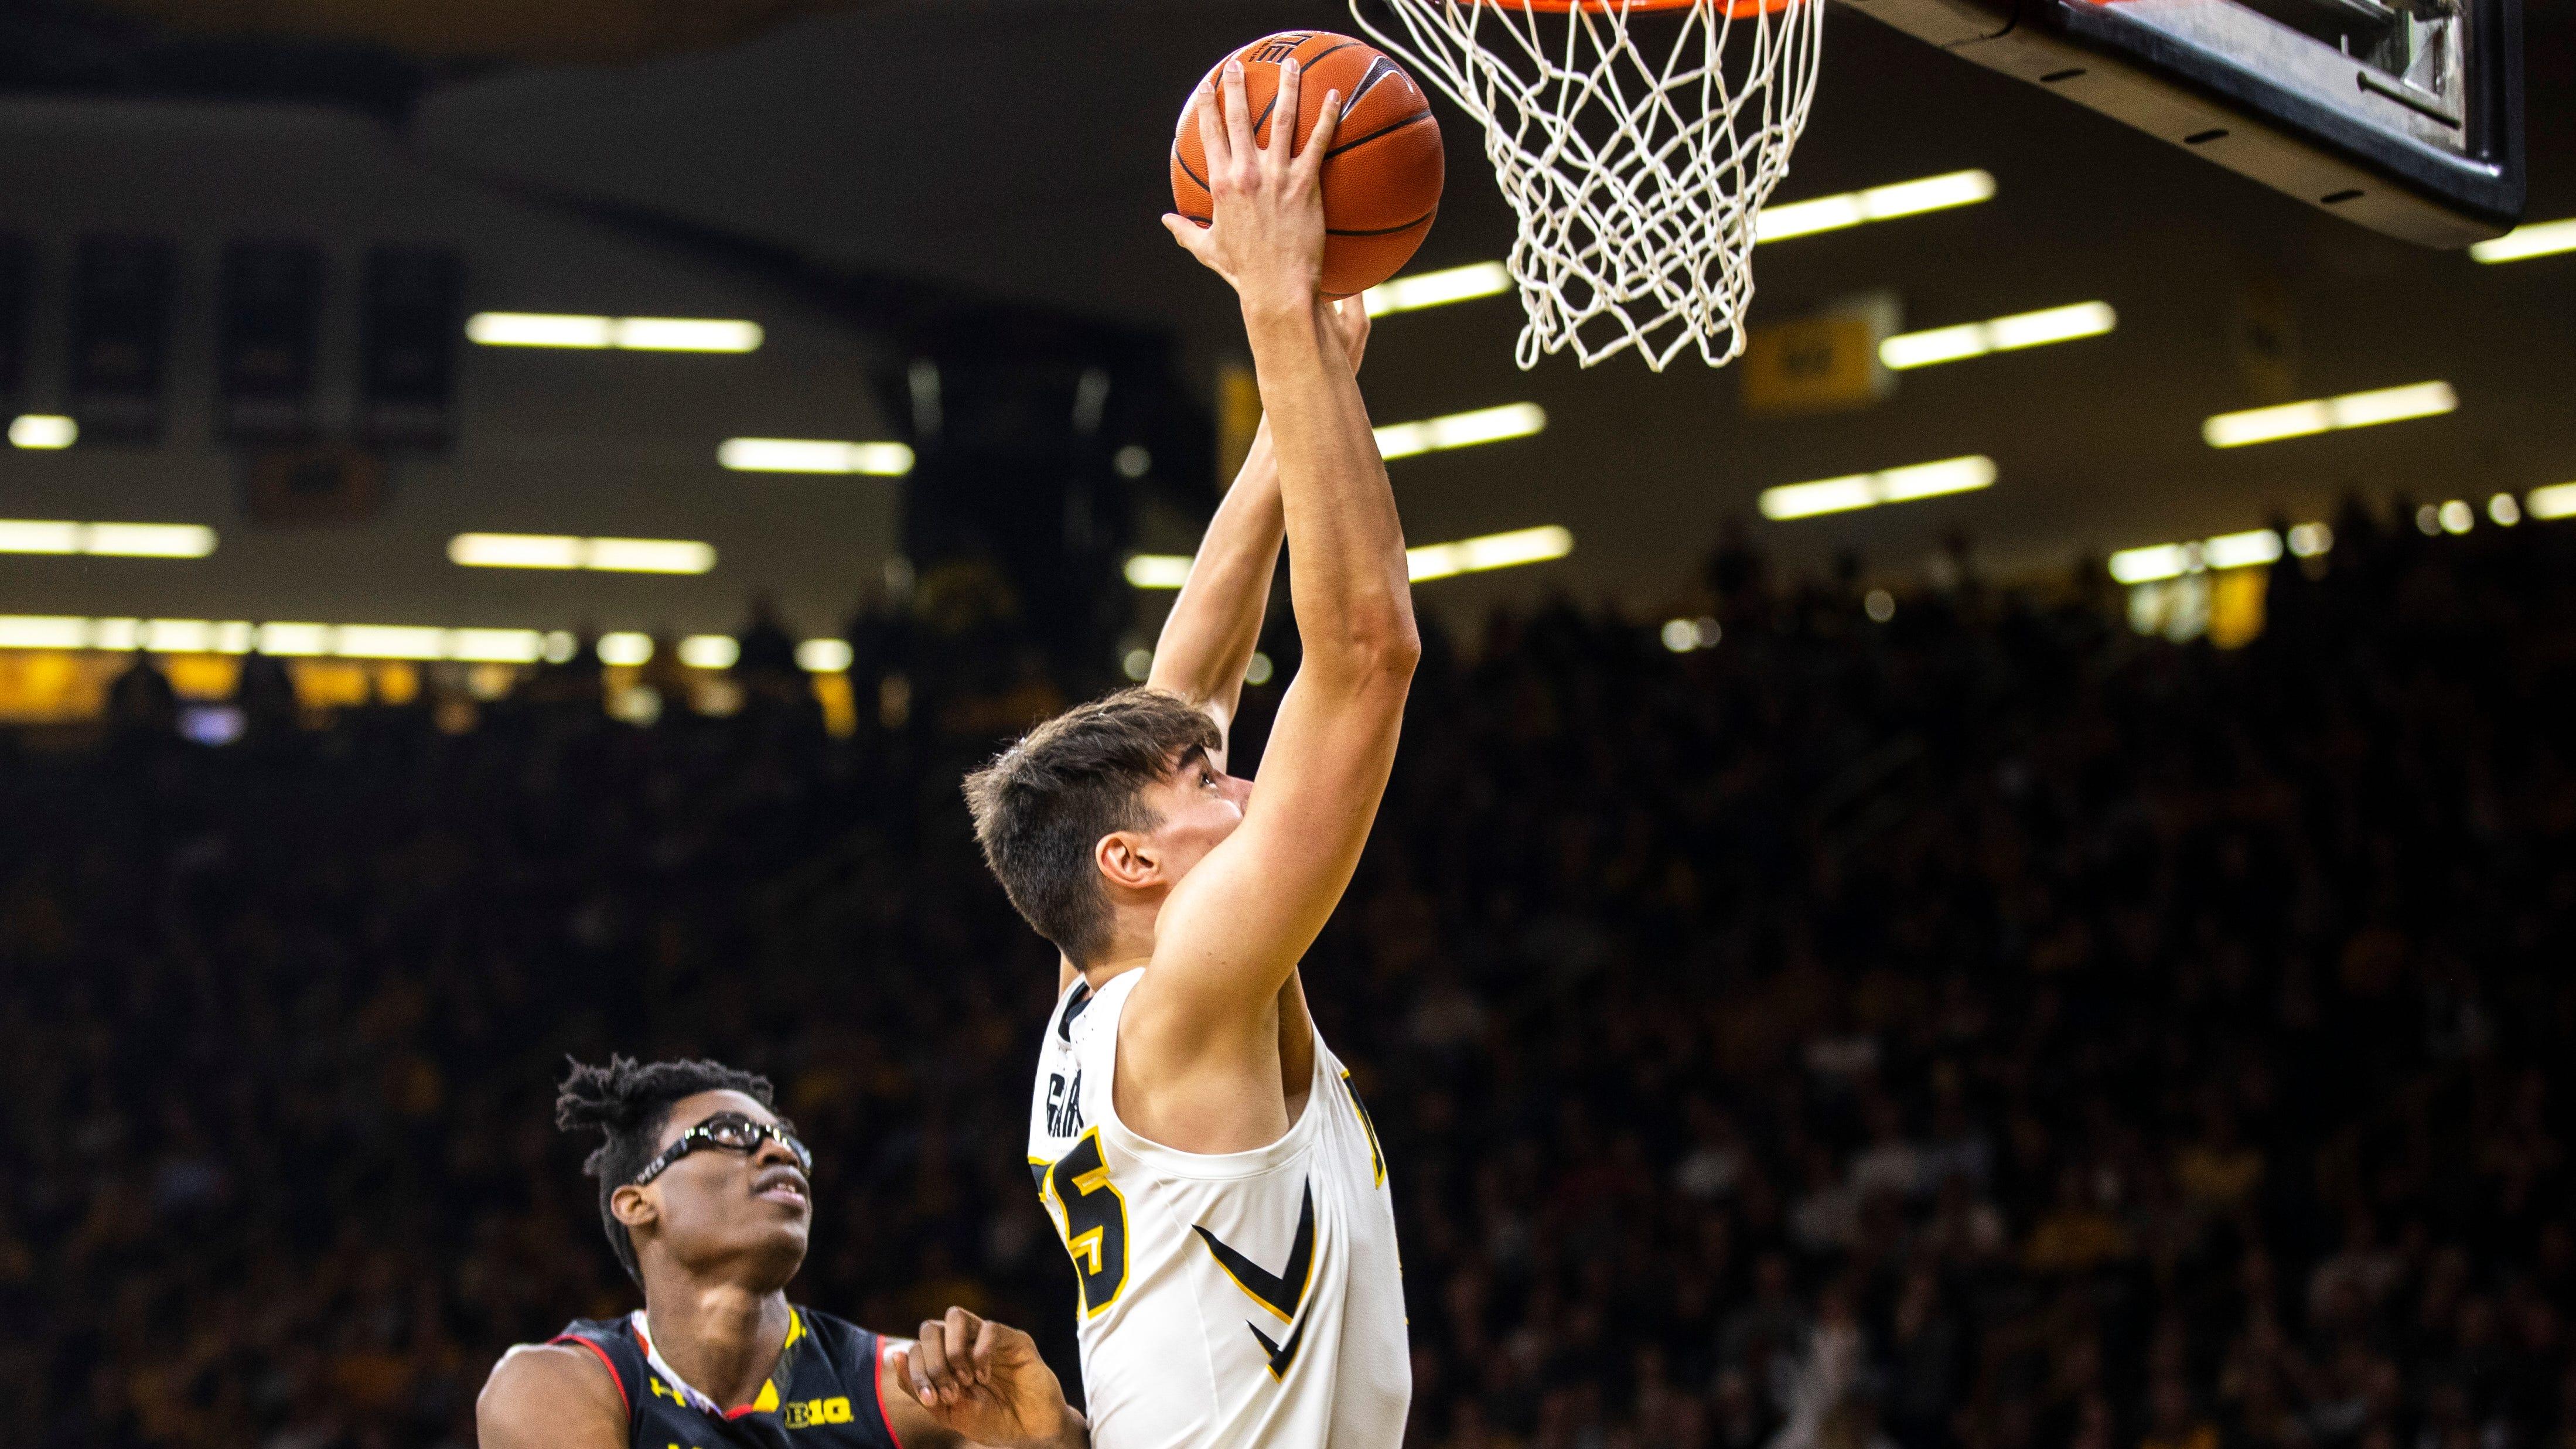 Iowa Hawkeyes men's basketball vs. Maryland Terrapins